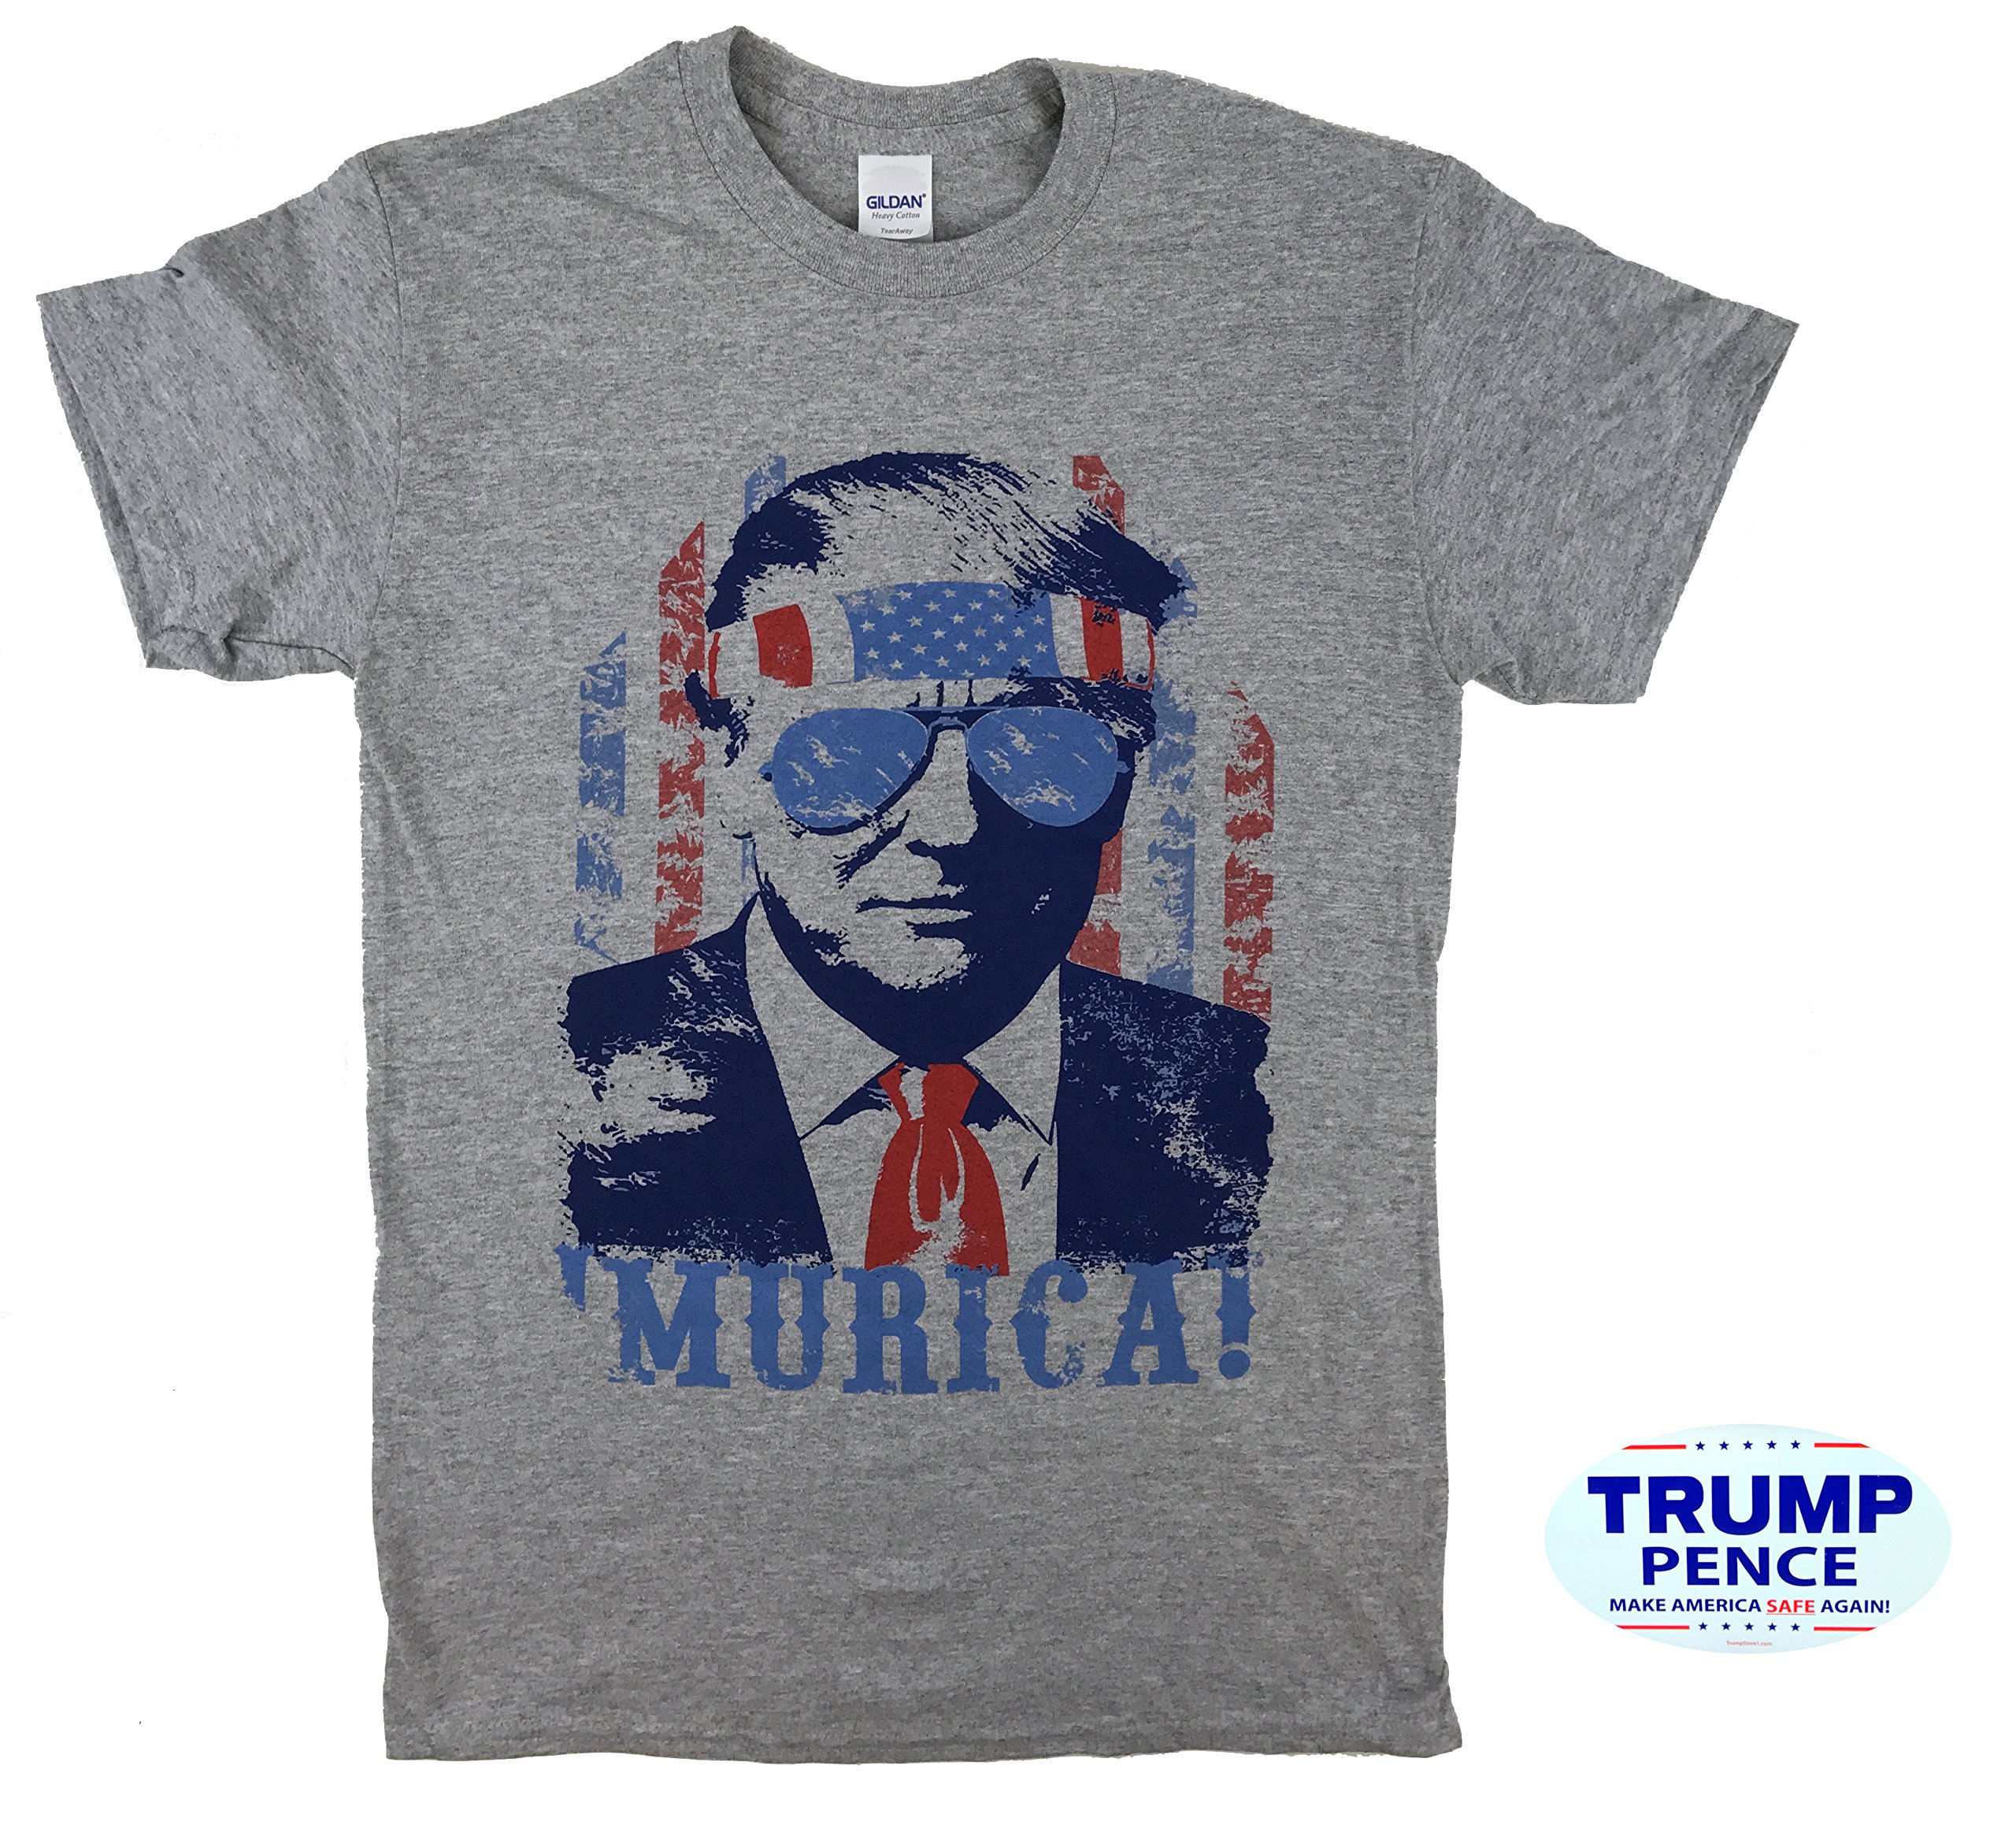 How-z-it Donald Trump 'Murica T Shirt With Free Bumper Sticker